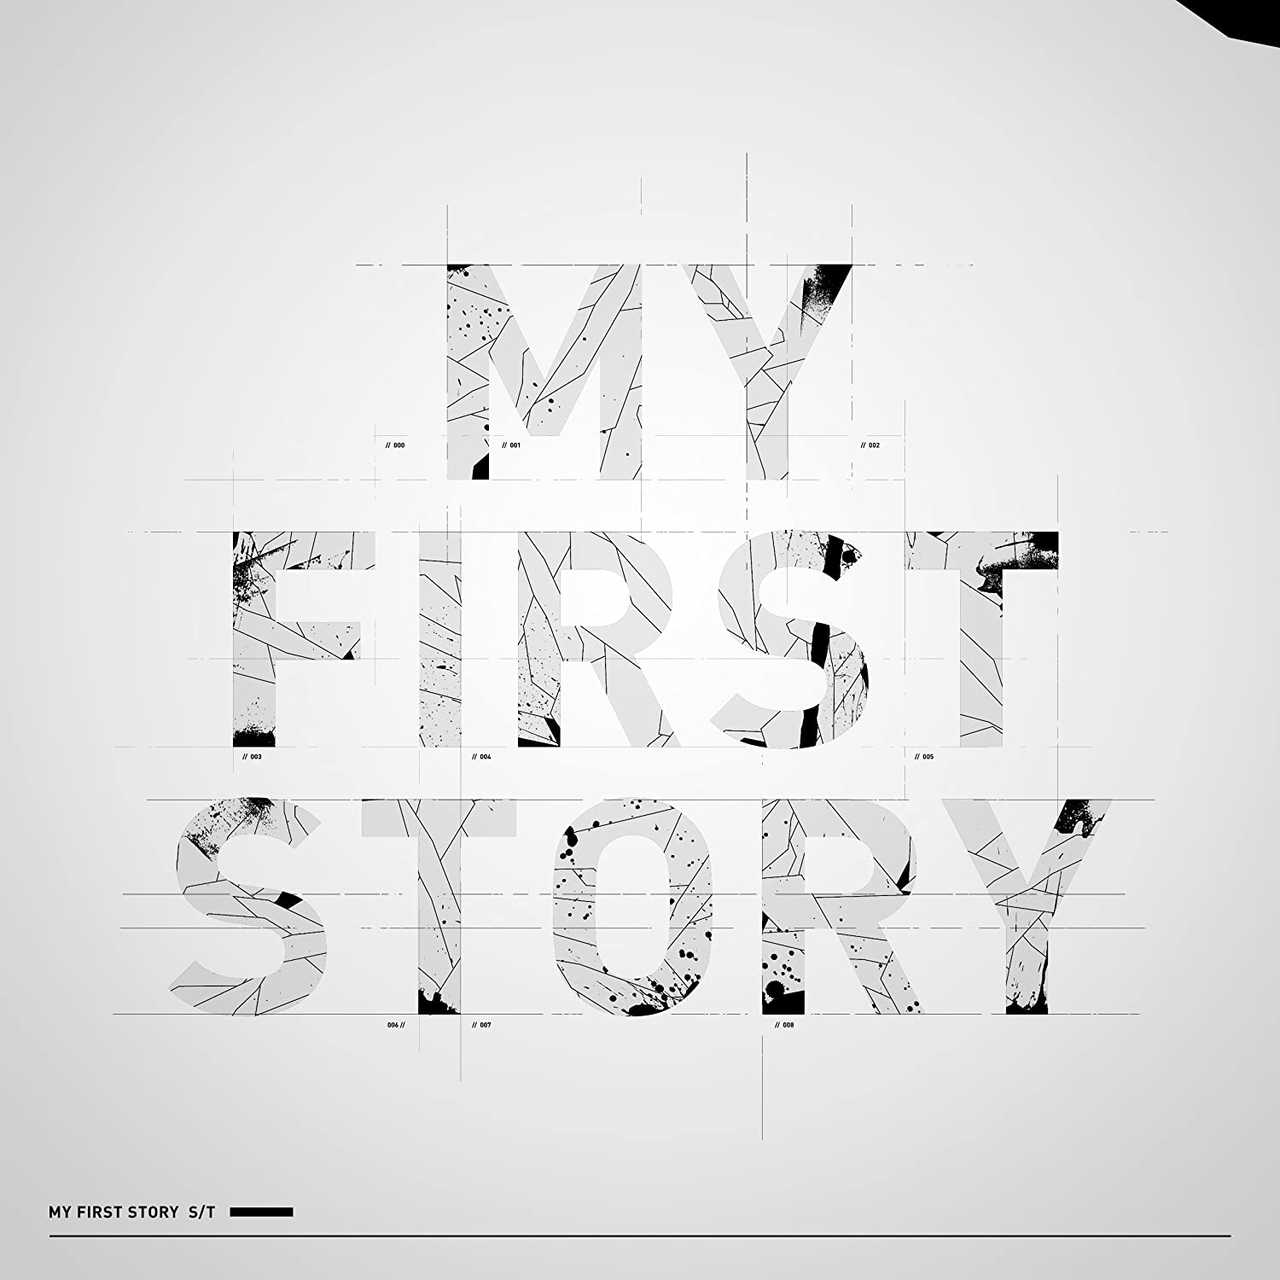 「MY FIRST STORY」快進撃が止まらない孤高のロックバンドに迫る